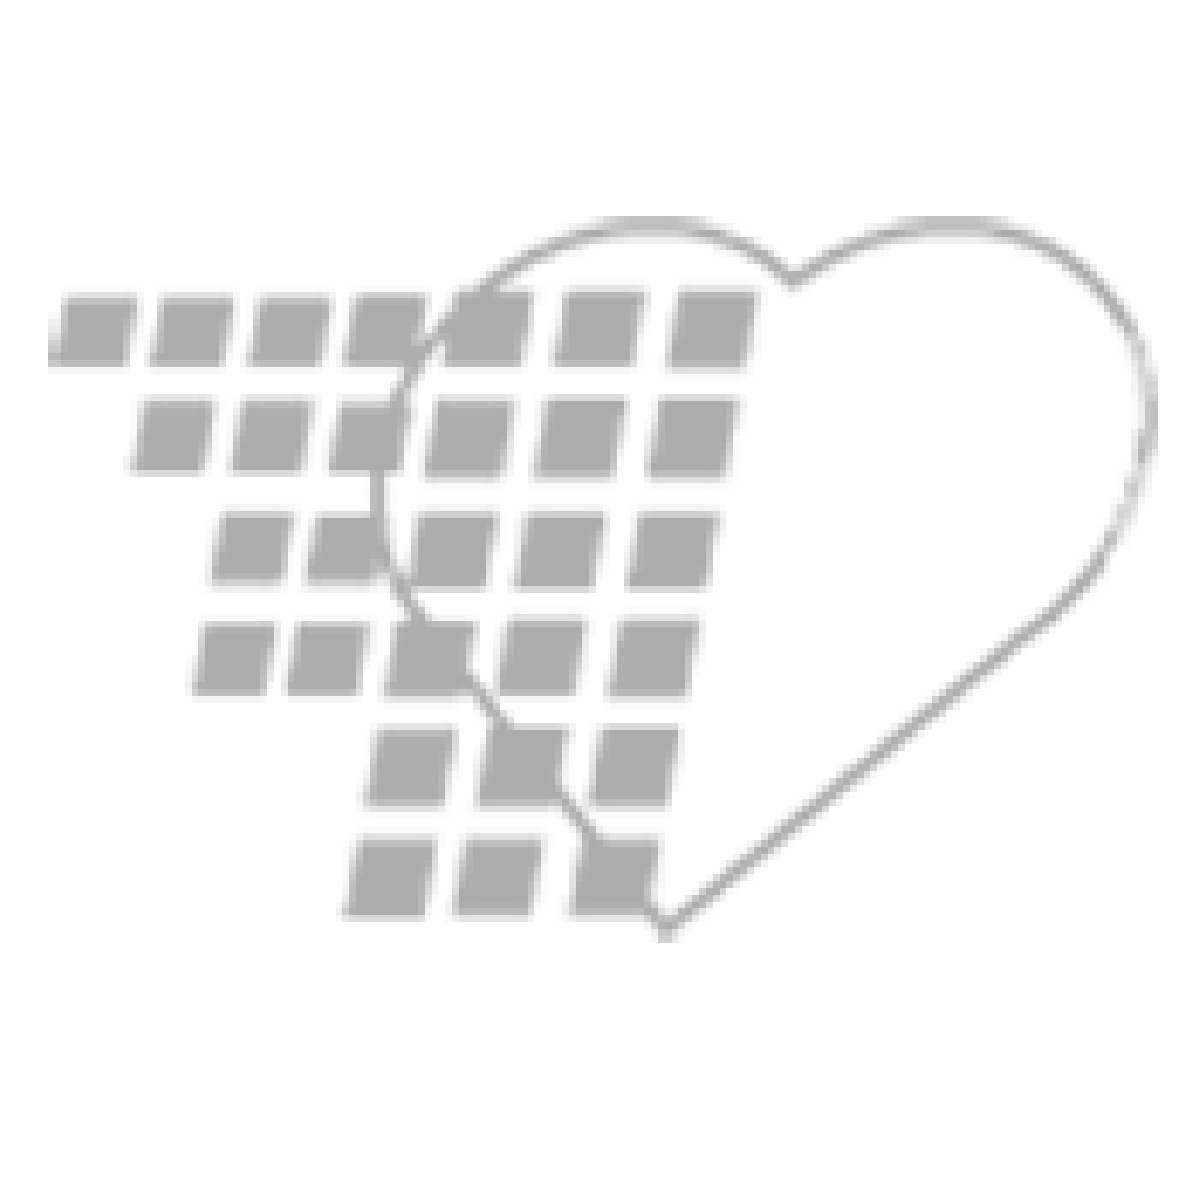 06-93-6202 Demo Dose® Simulated Platelets B Rh Negative